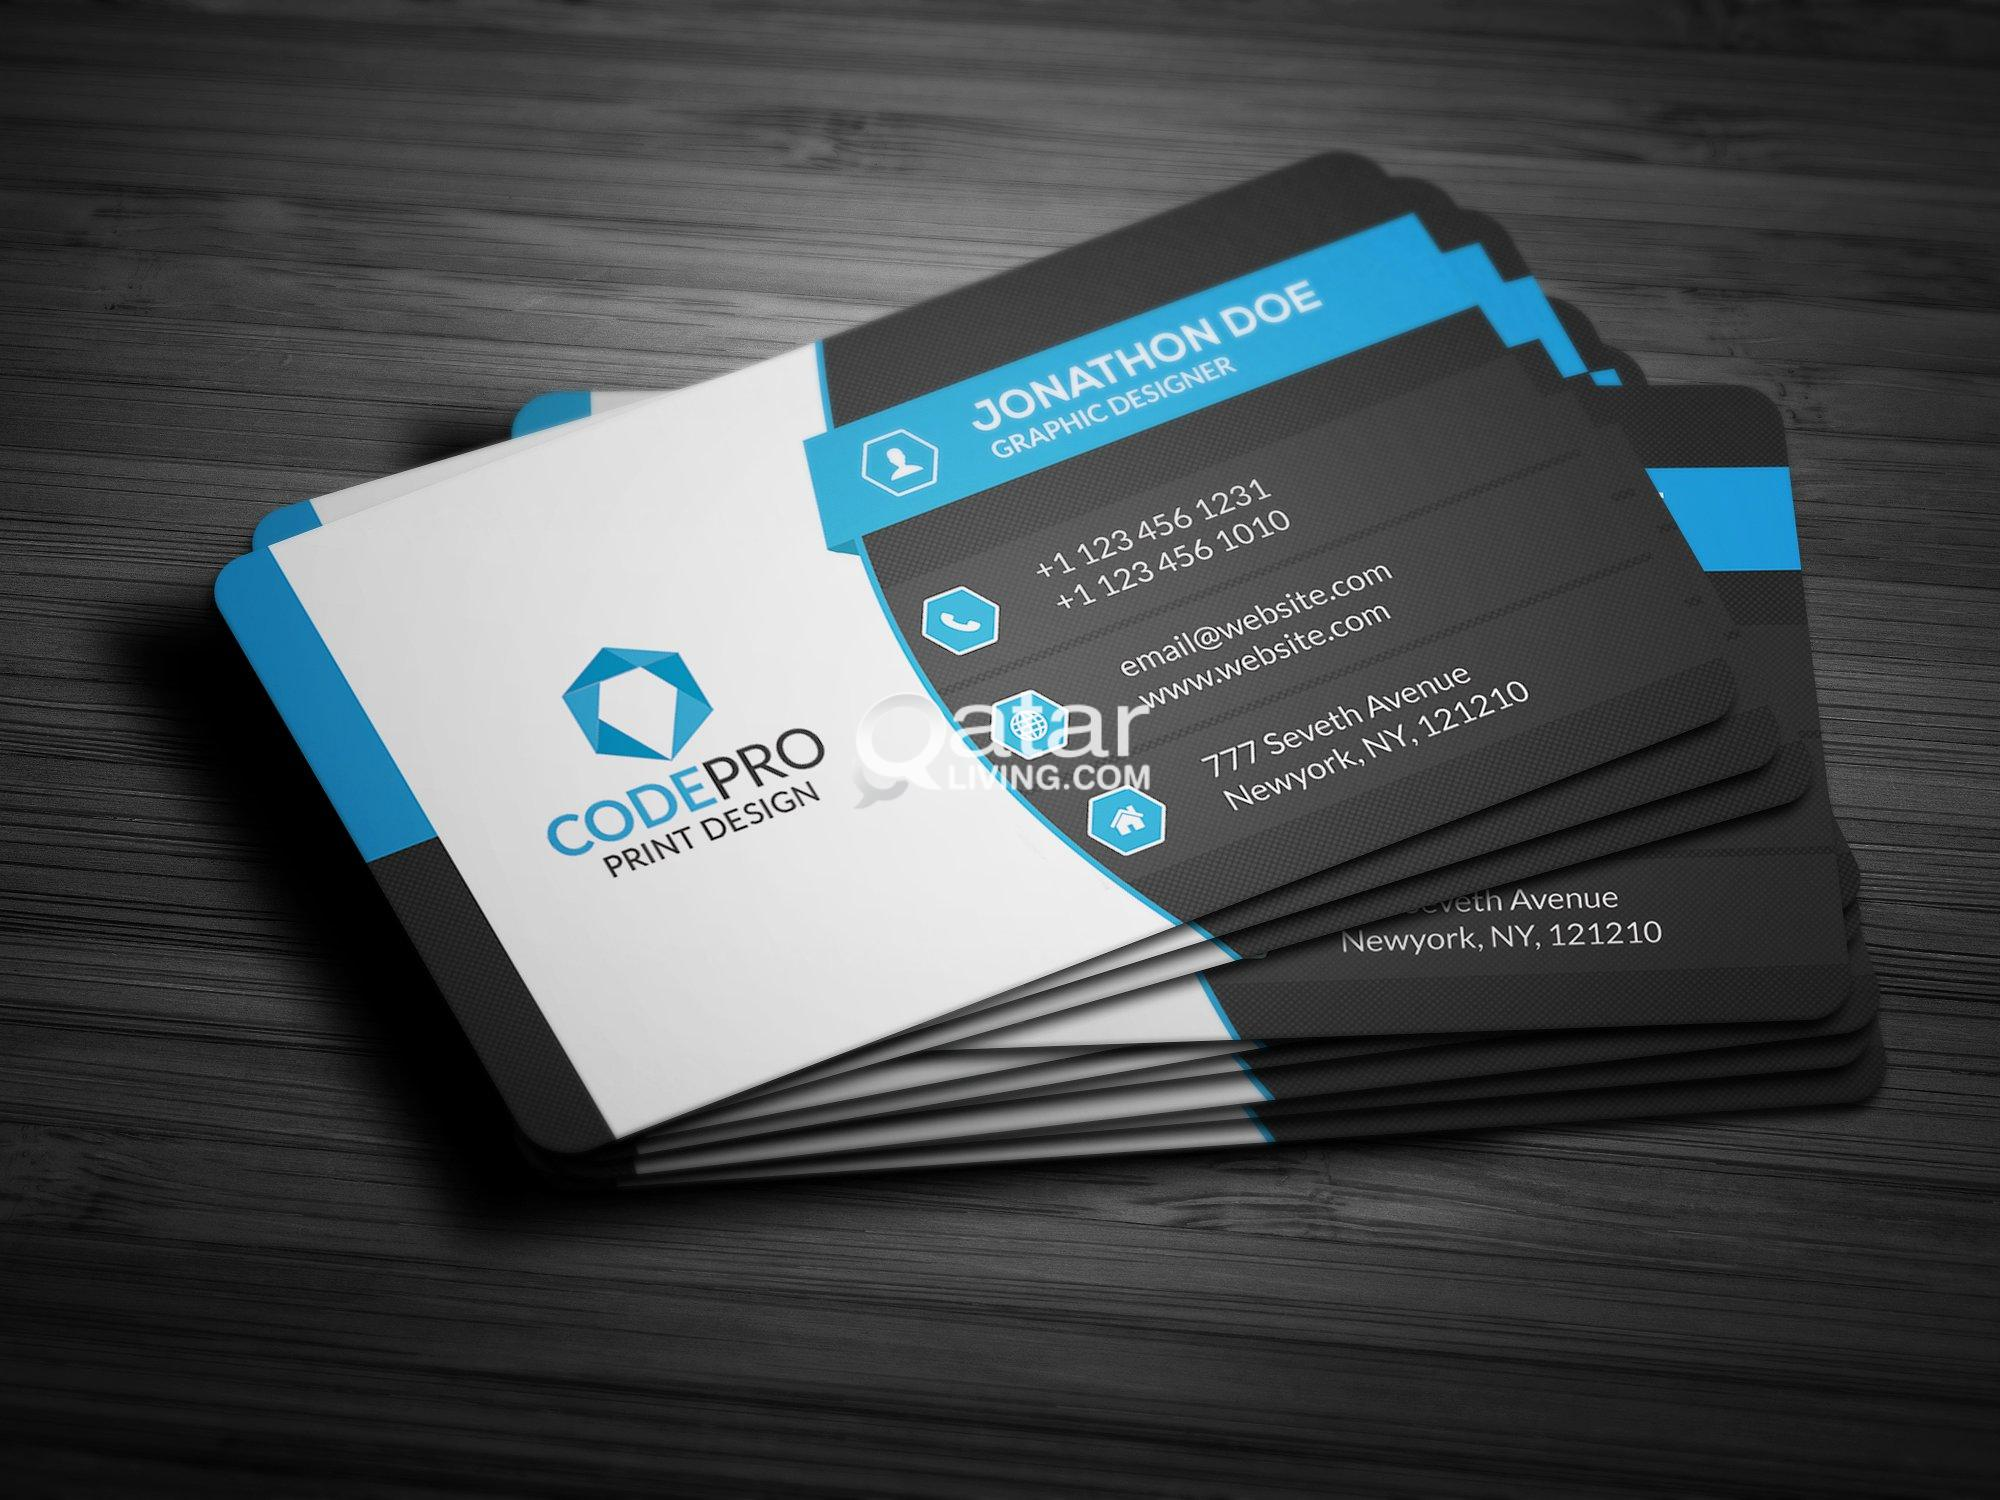 Freelance logo designerbrochurebusiness carddesignsflyerproduct freelance logo designerbrochurebusiness carddesignsflyerproduct photography c designs qatar living reheart Images